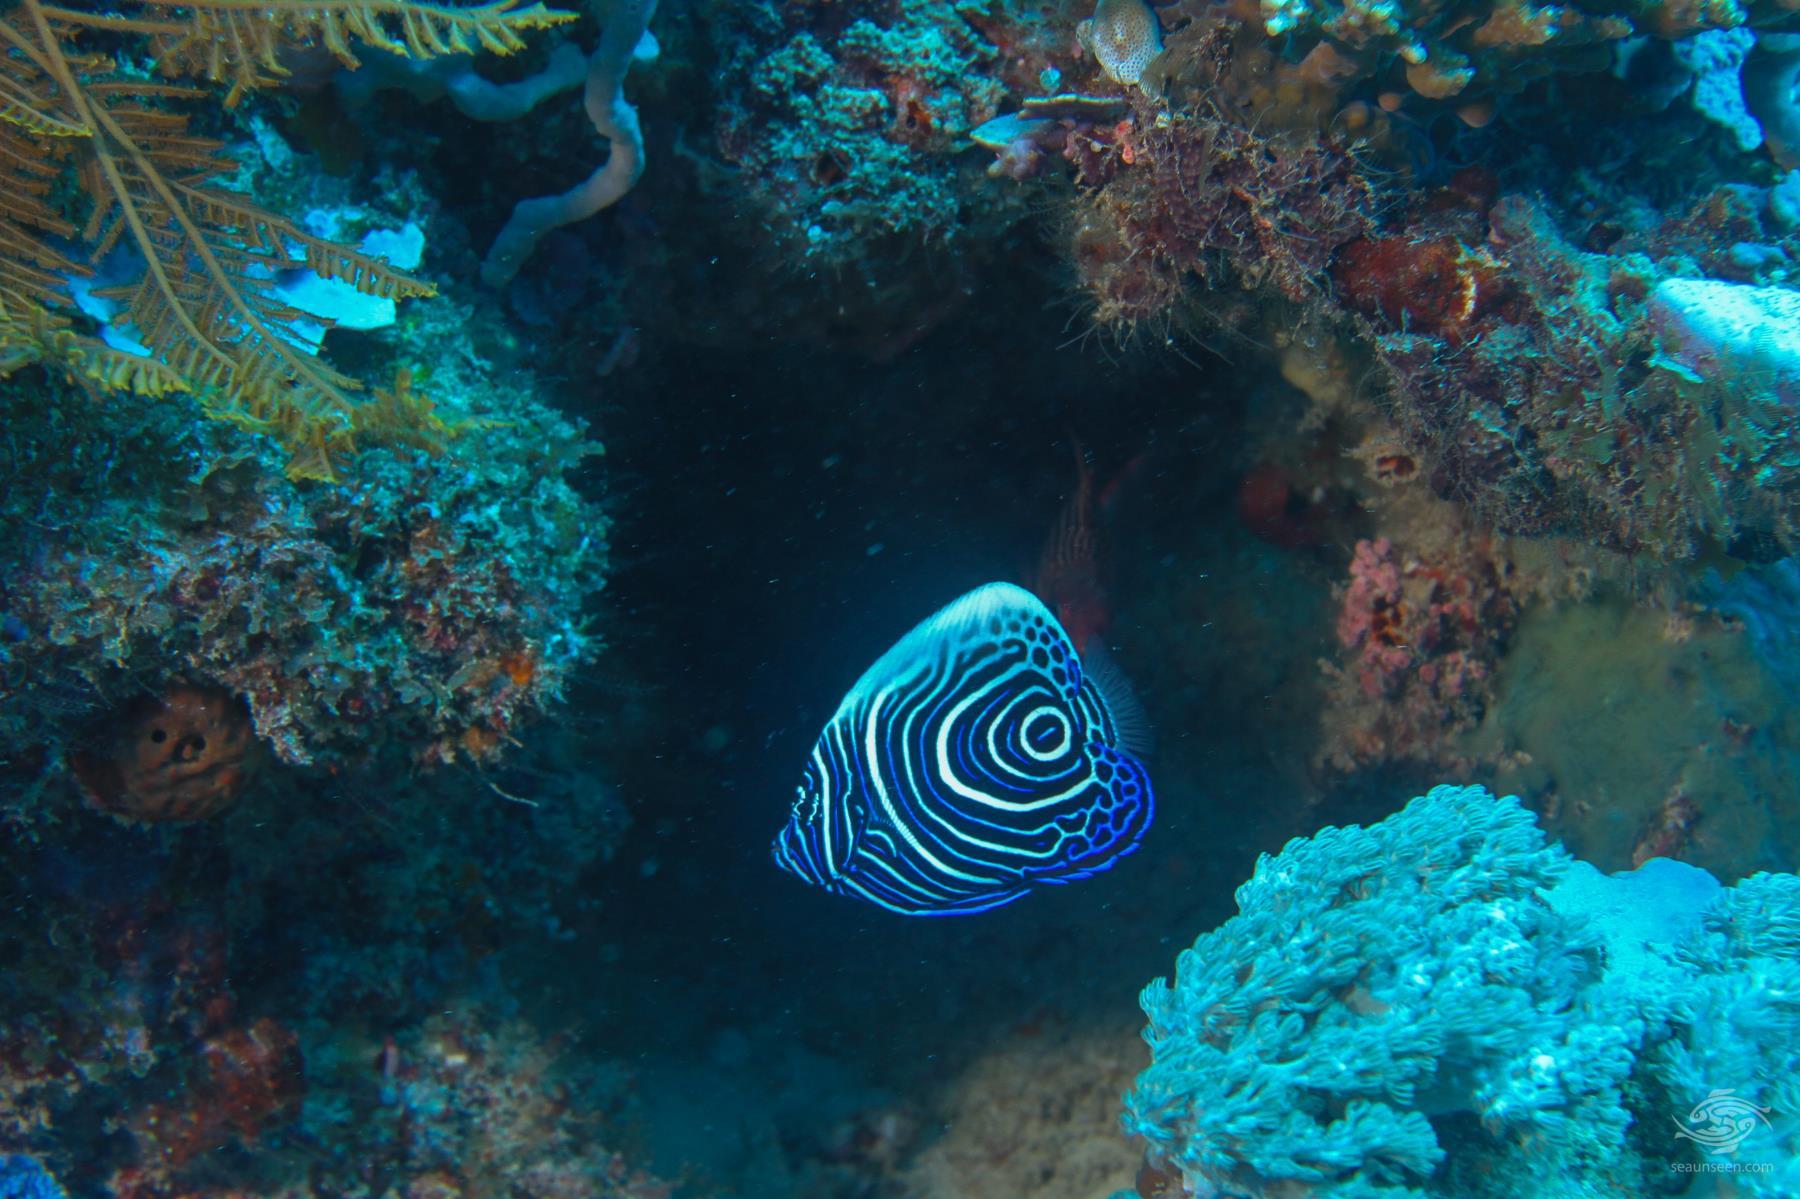 Juvenile emperor angelfish, Pomacanthus imperator